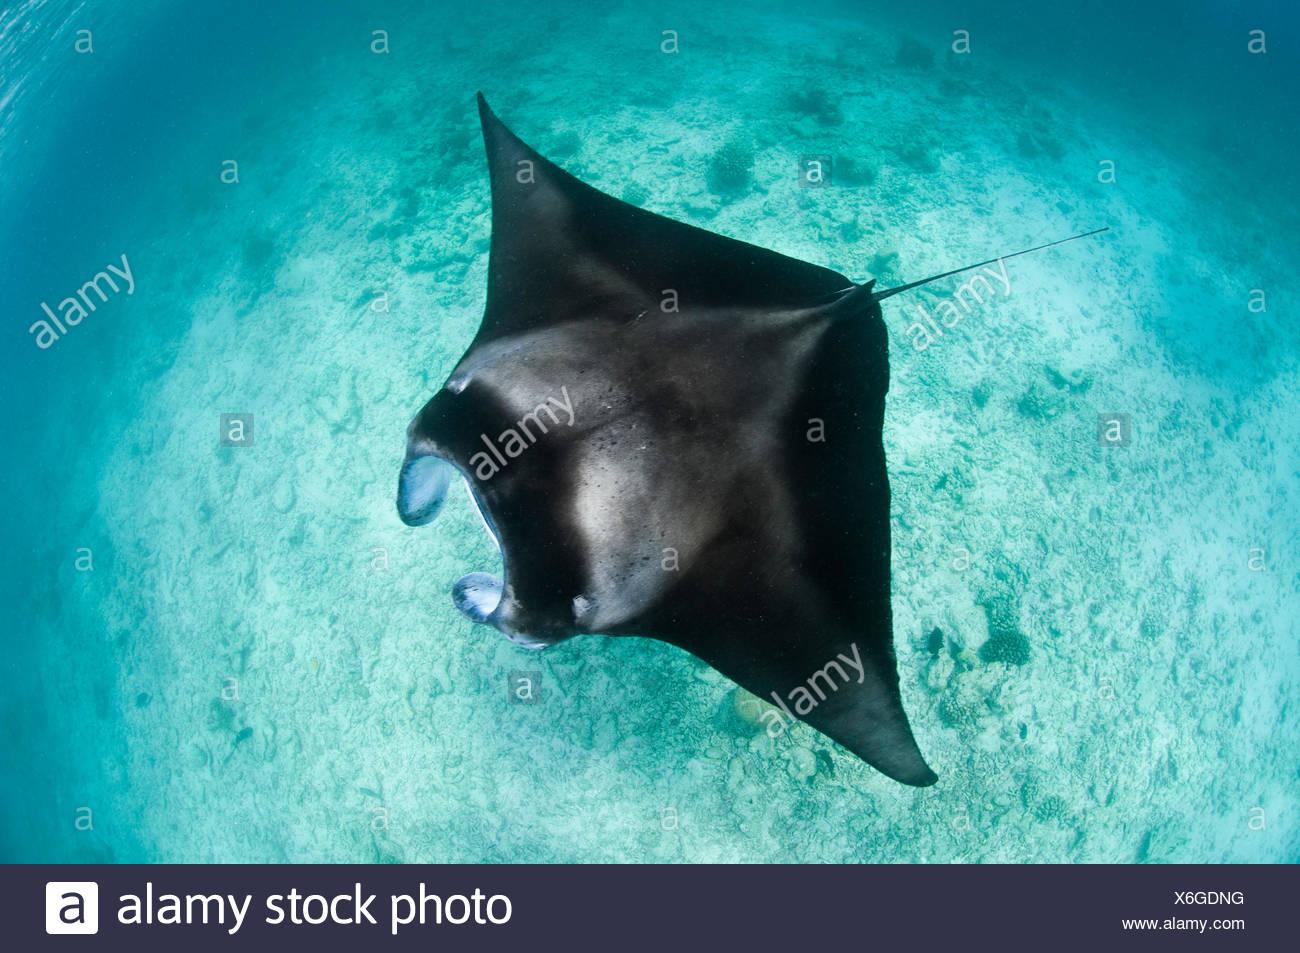 Gran Manta Ray (Manta birostris) alimentándose de plancton en aguas poco profundas, visto desde la superficie. Laguna Hanifaru, Baa Atoll, Maldivas. Océano Índico. Imagen De Stock